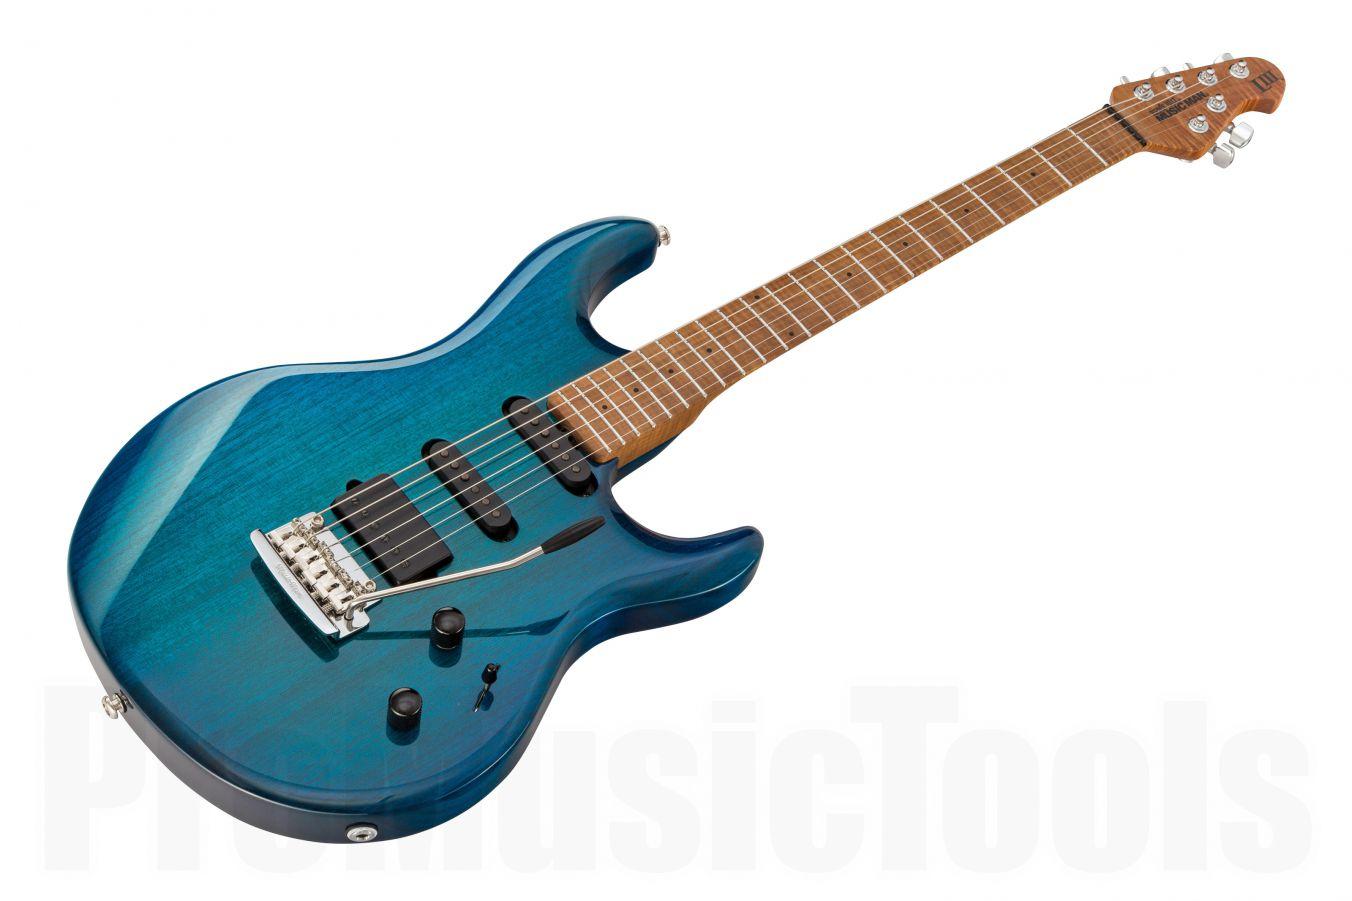 Music Man USA Luke III HSS NB - PDN Neptune Blue Roasted Neck Limited Edition MN